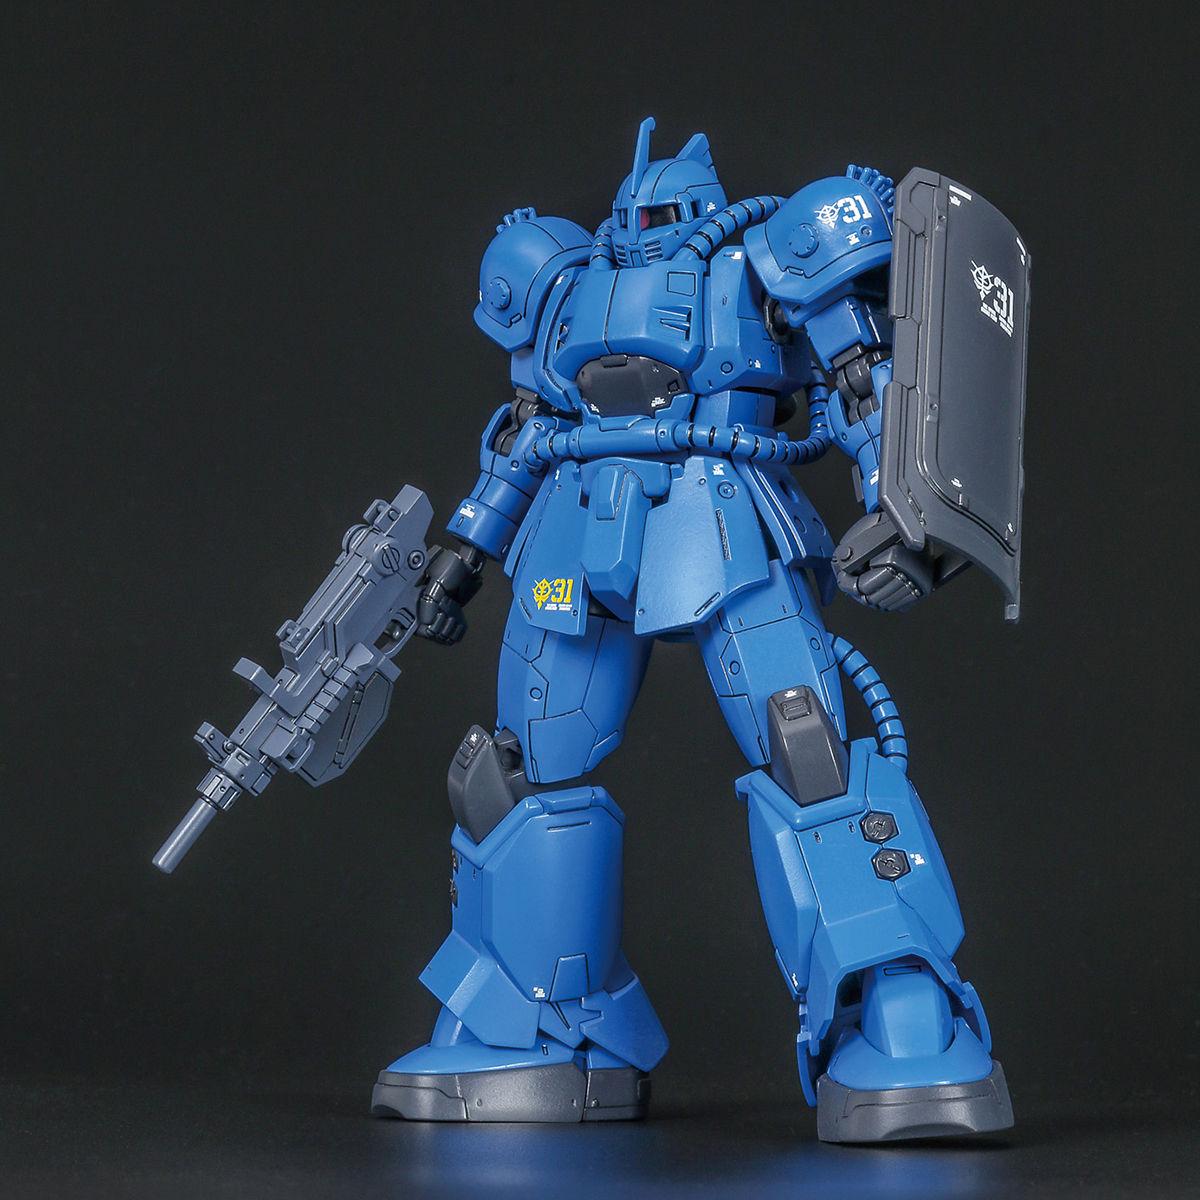 HG 1/144 MS-04 ブグ(ランバ・ラル機) [Bugu (Ramba Ral Custom)] 0210504 5057735 4549660105046 4573102577351